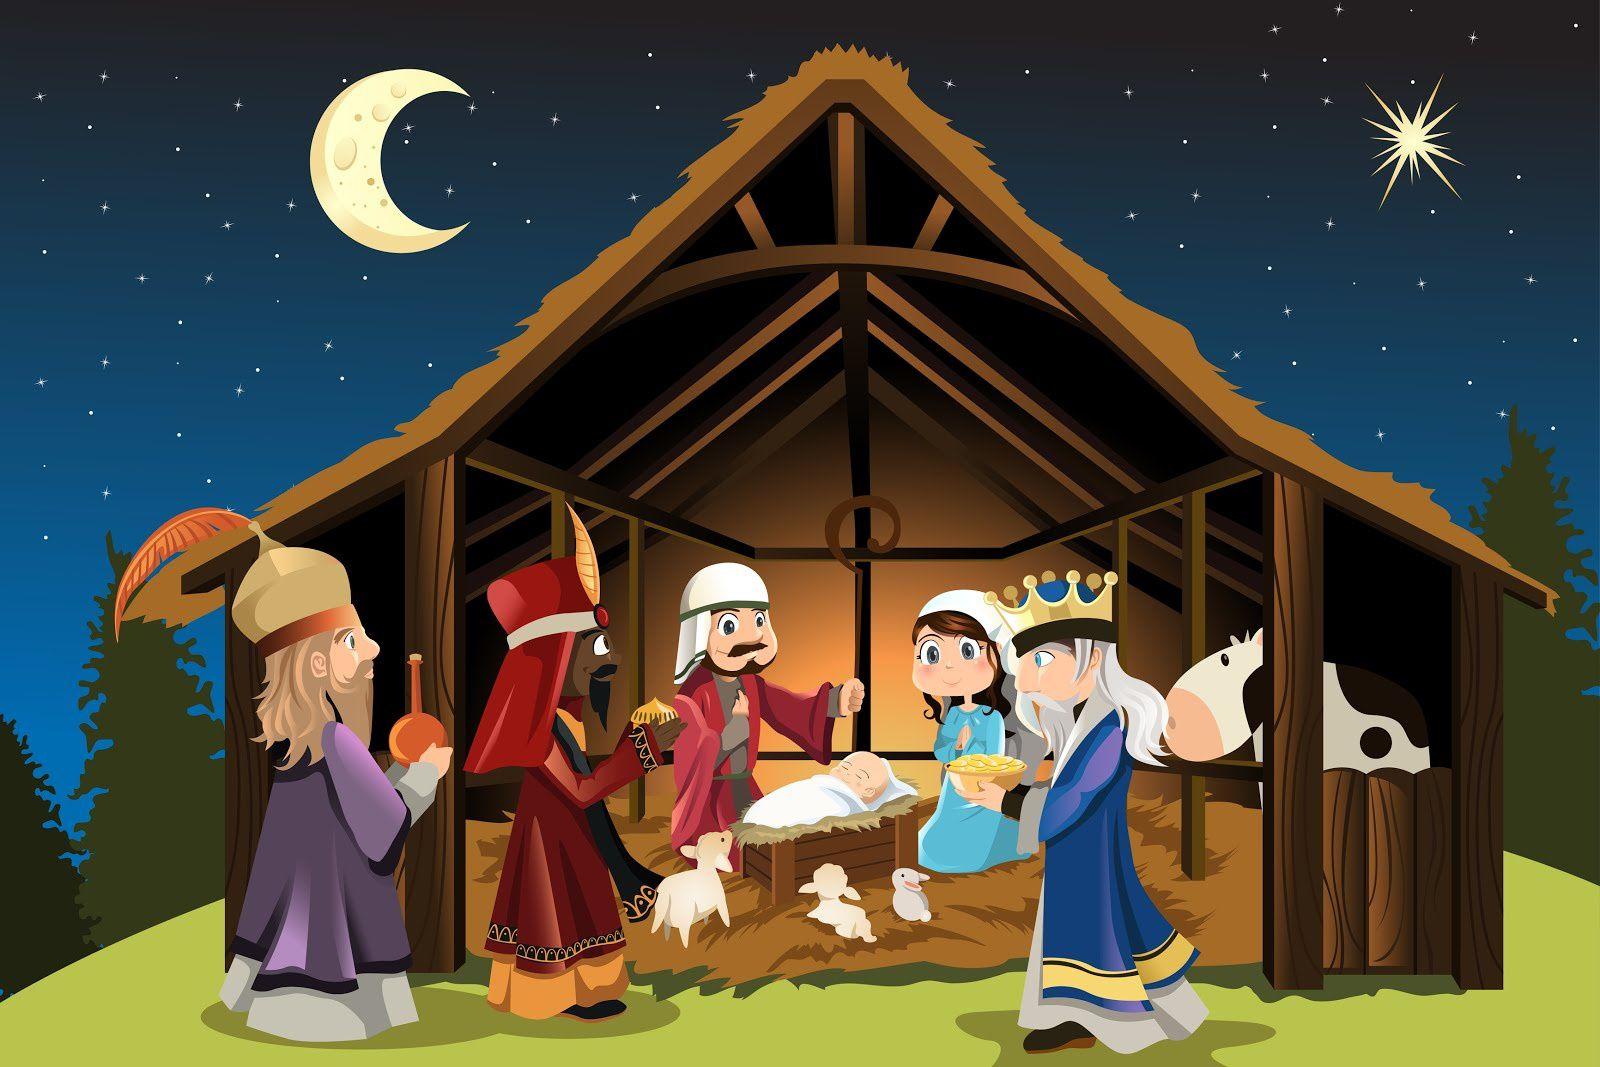 Navidad y el bel n - Portal de belen pinypon ...